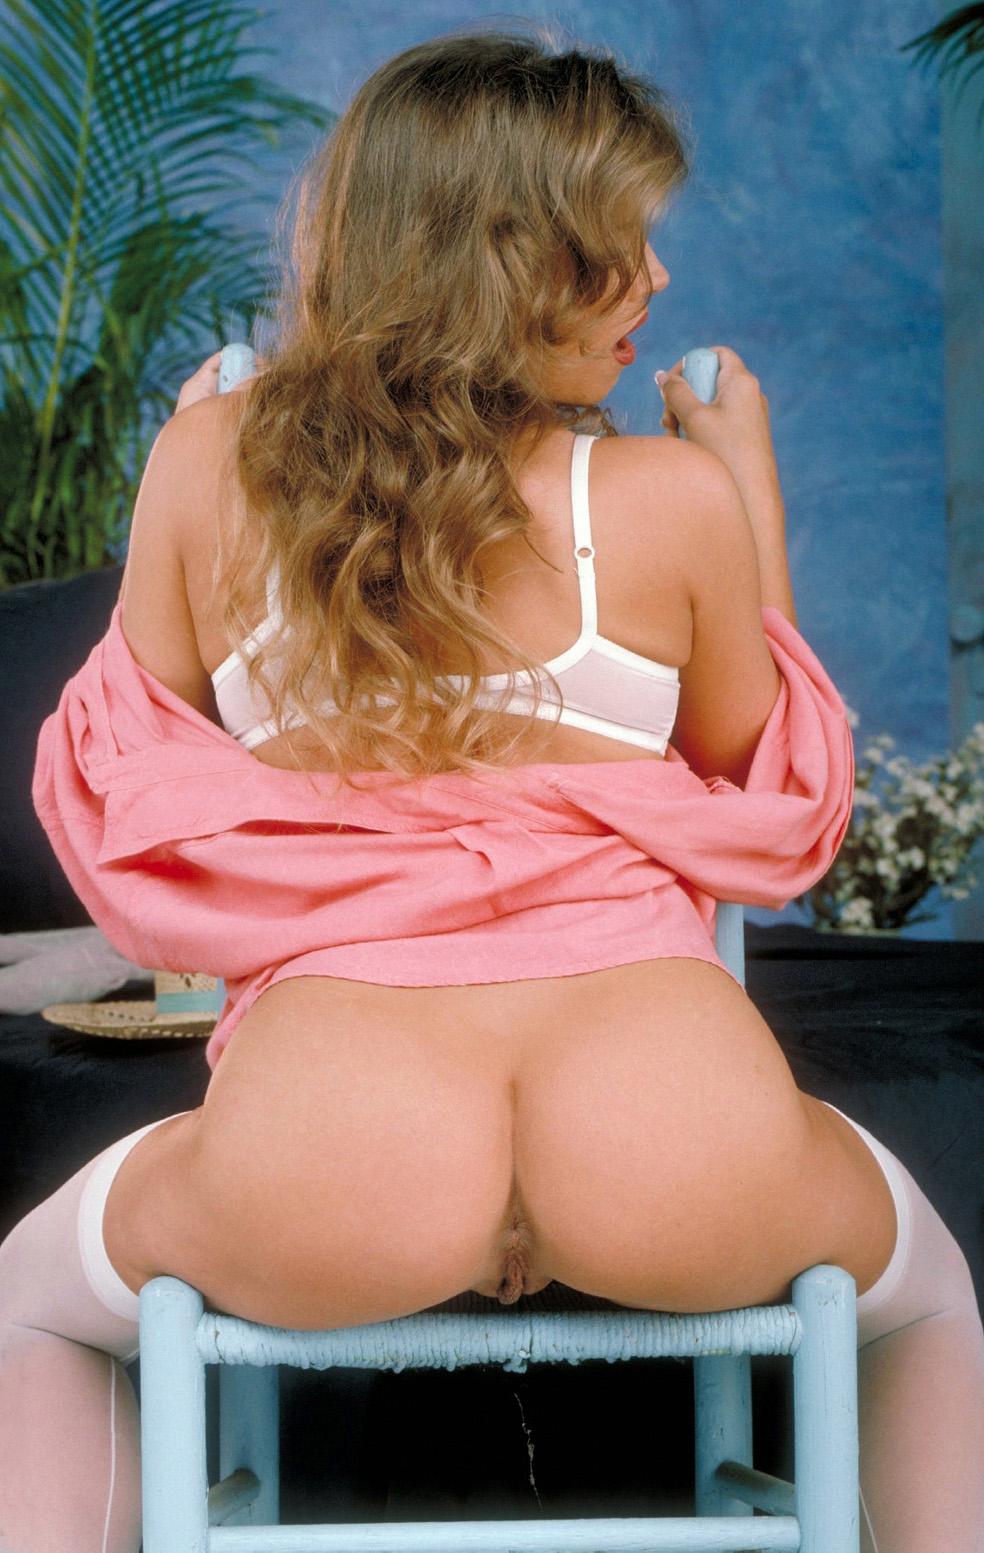 90s Porn star Lori Michaels 07.jpg